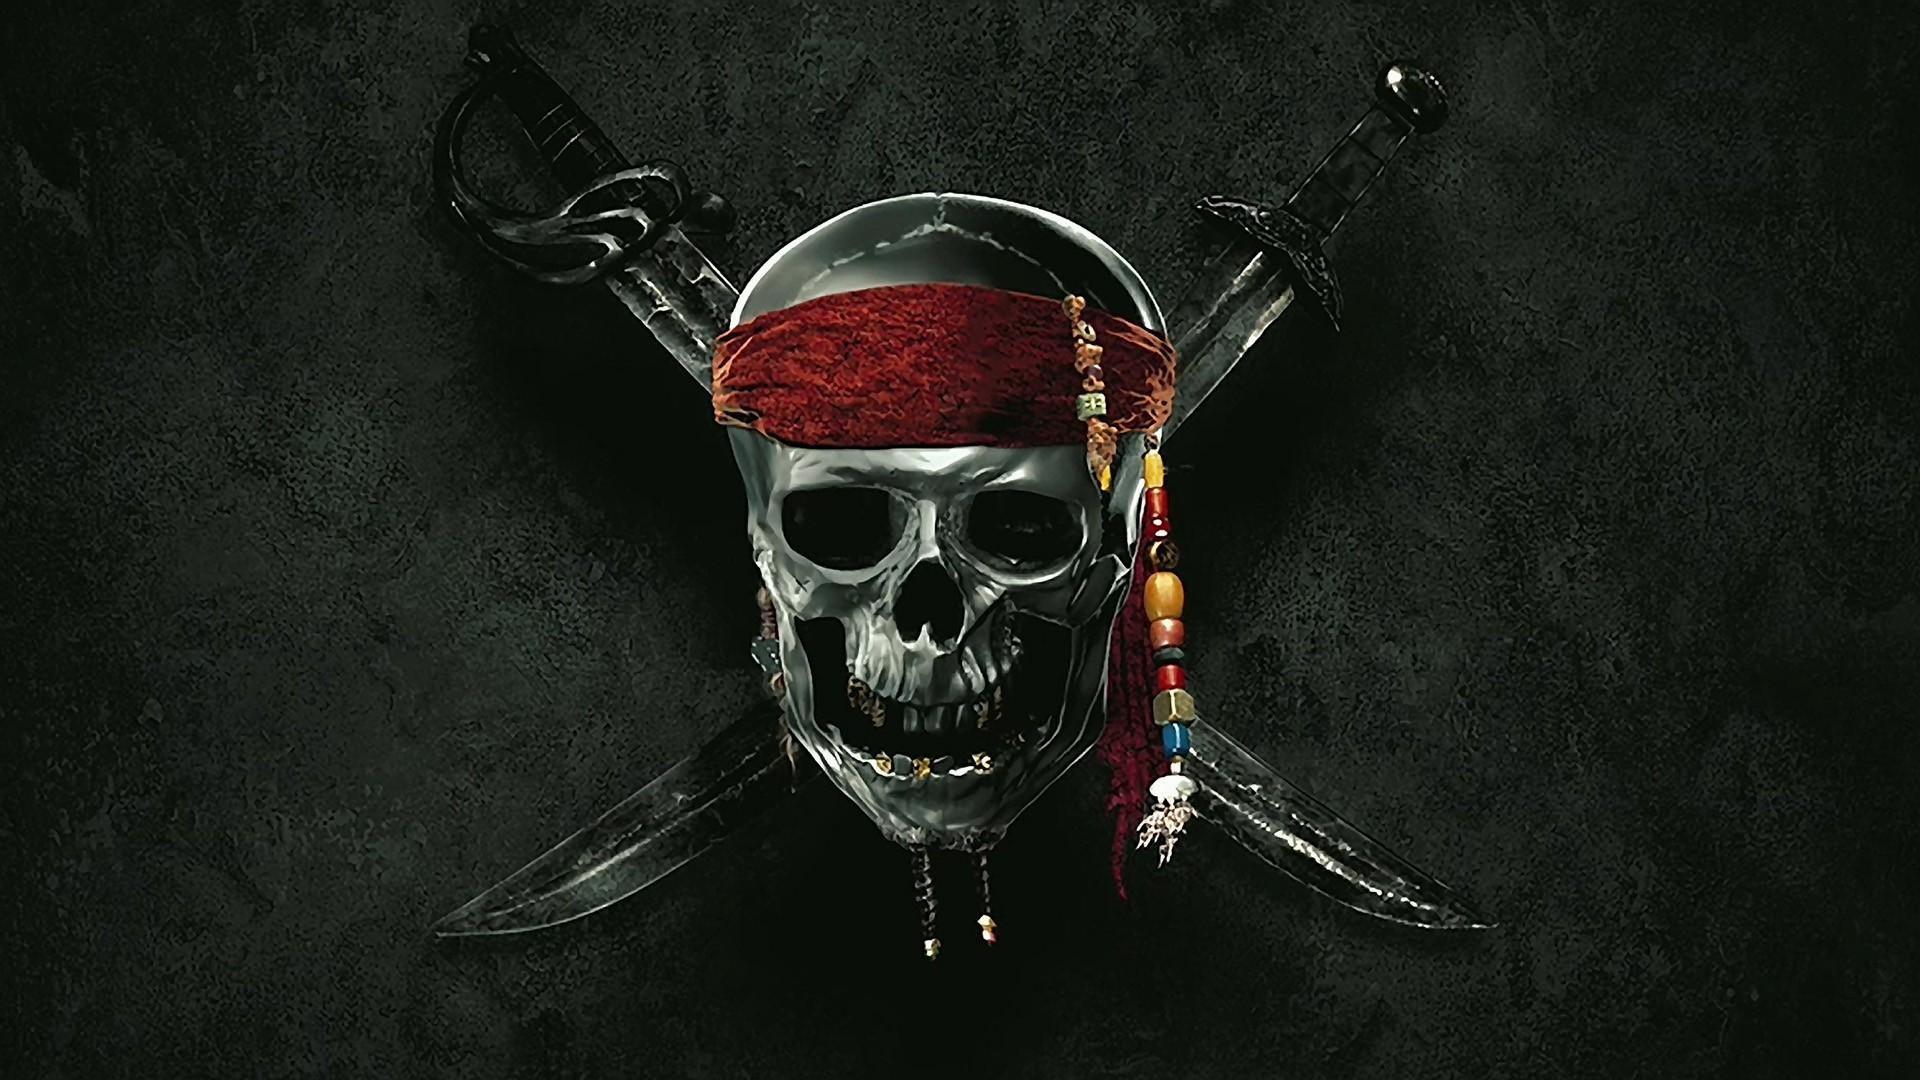 Res: 1920x1080, Black Skull HD desktop wallpaper : High Definition : Fullscreen